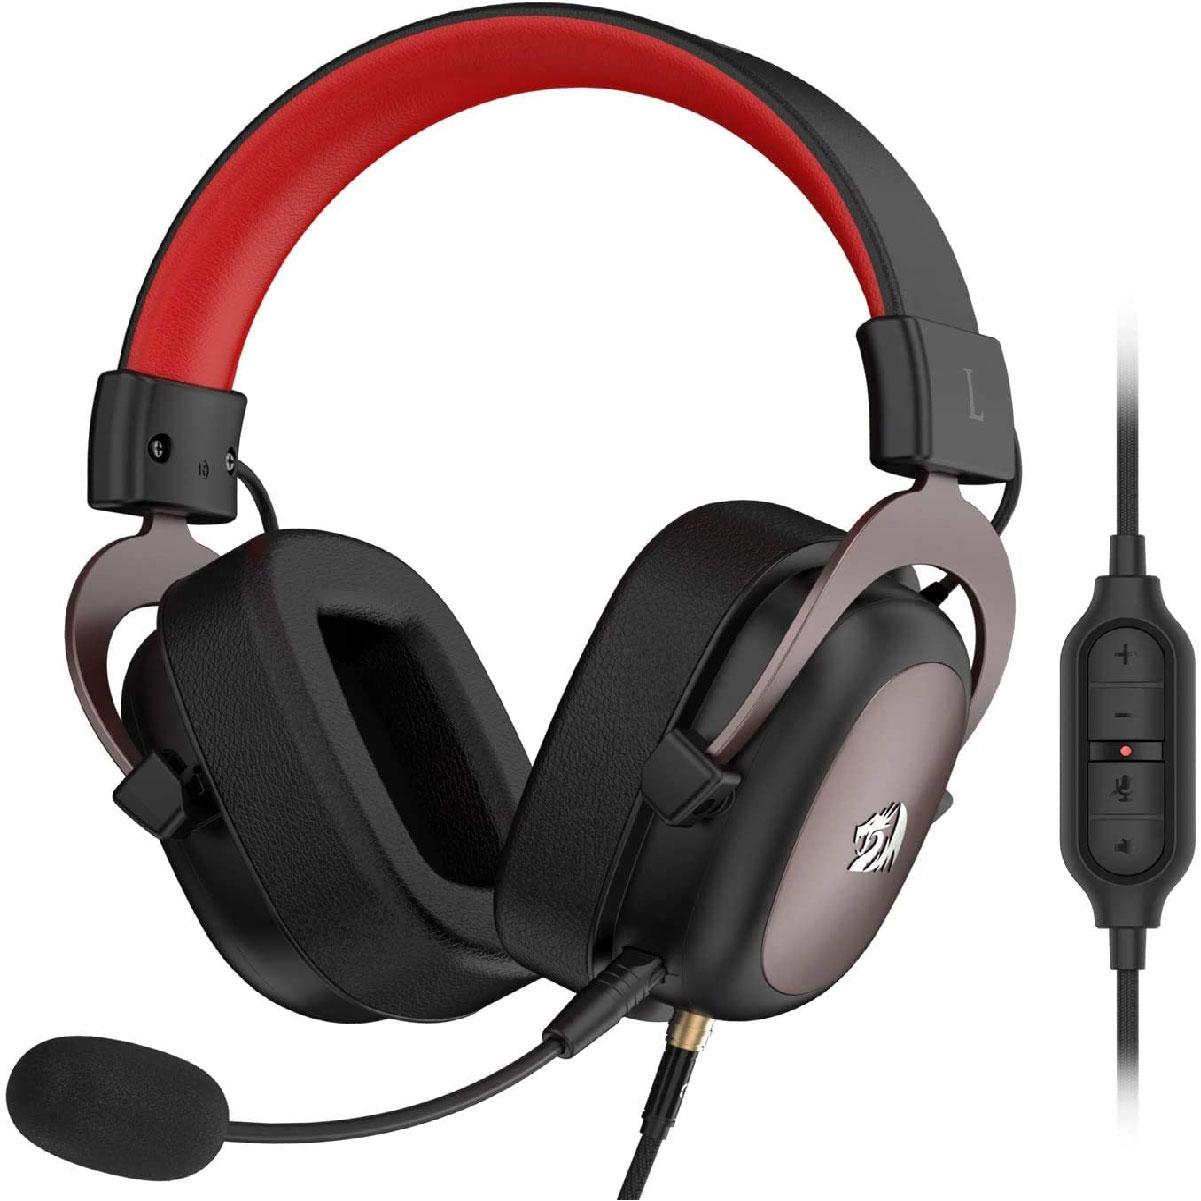 Headset Redragon Zeus 2, USB, Surround 7.1, H510-1W